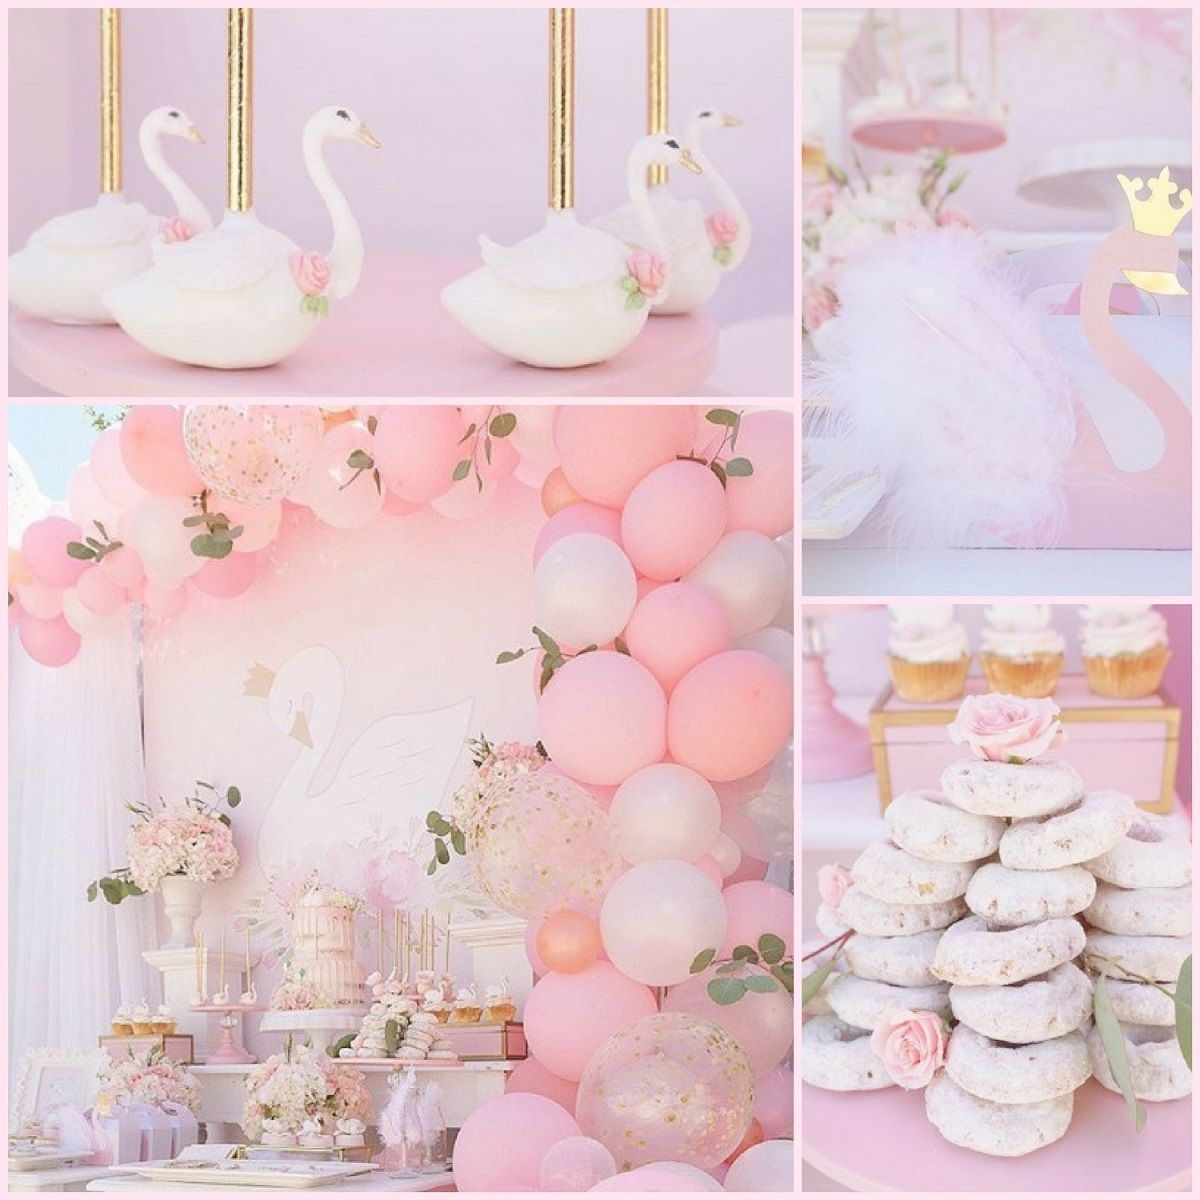 Pink Swan Party Swan Baby Shower Inspiration Babyshowerideas4u Birthdayparty Babyshowerdecorati Swan Baby Shower Garden Baby Showers Baby Shower Inspiration